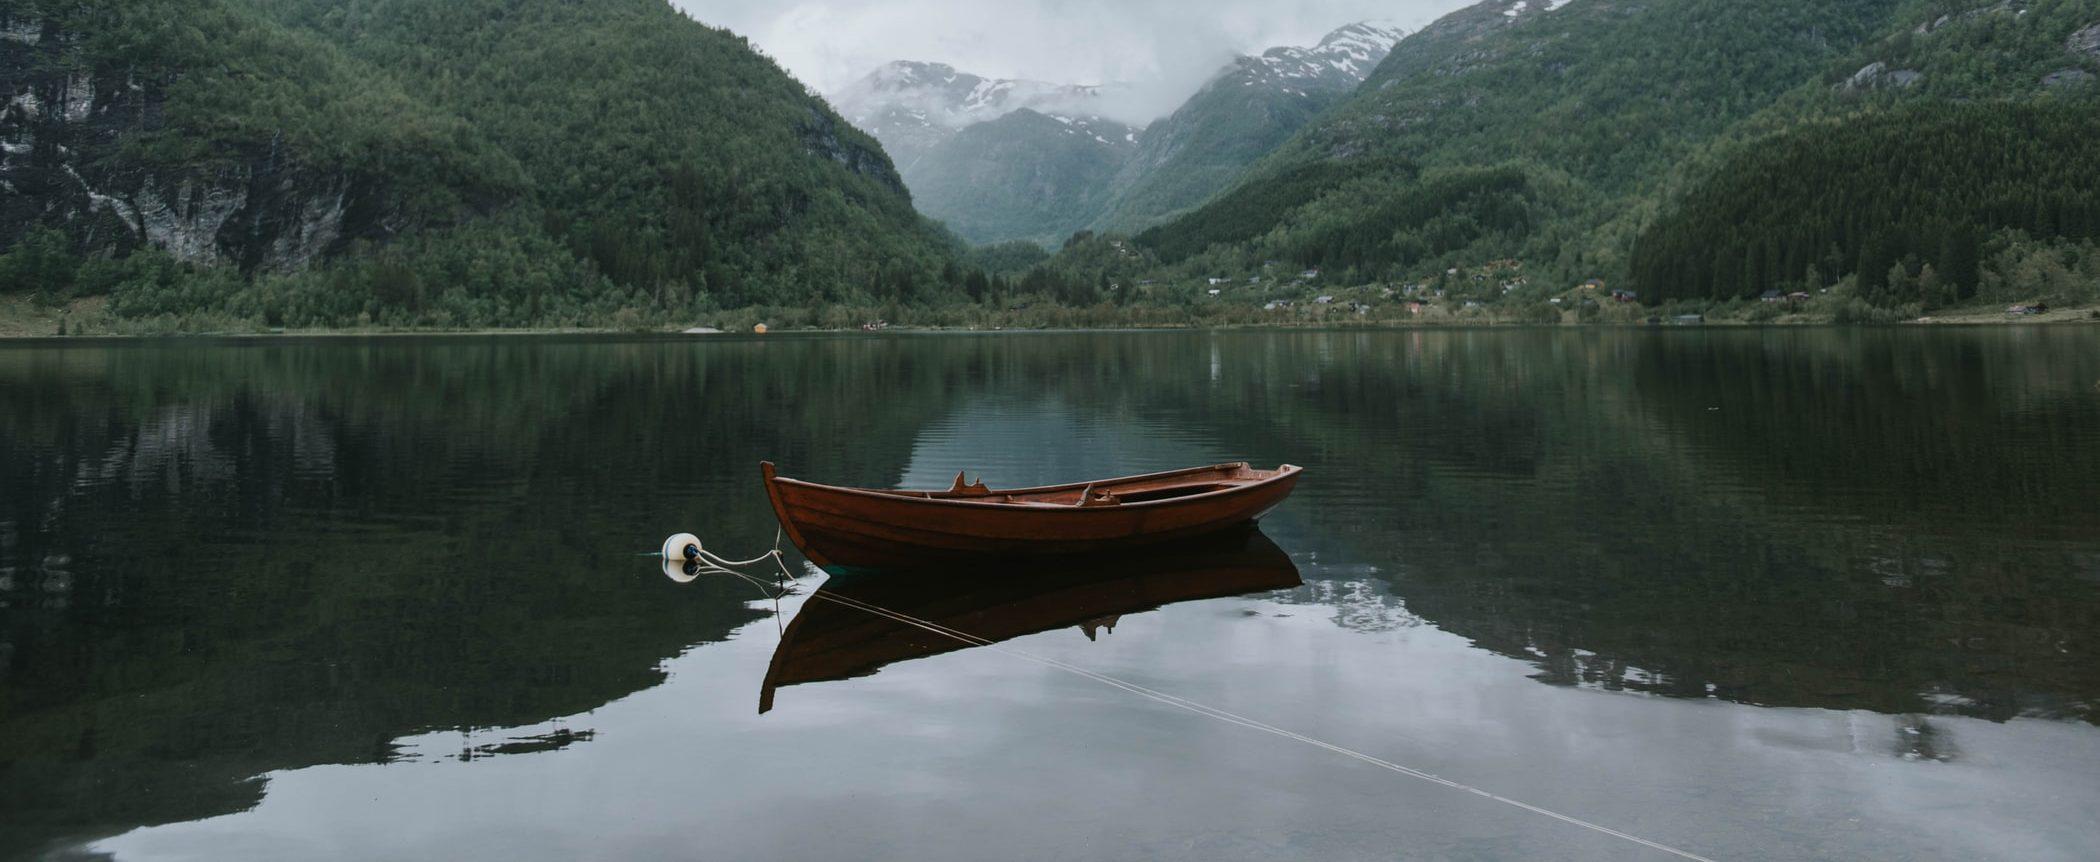 Kuhu minna kalareisile – Norra